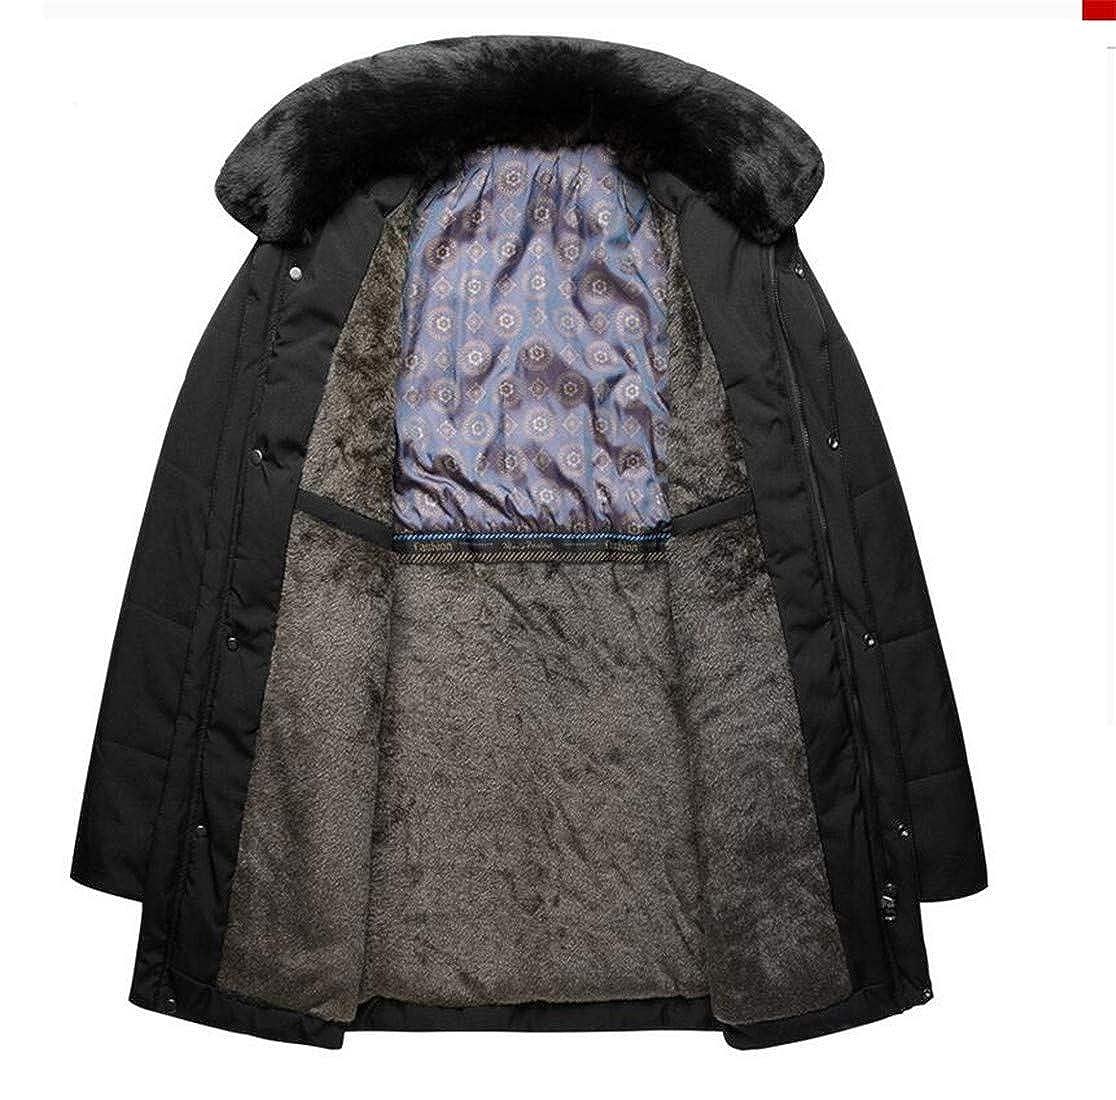 Wofupowga Mens Warm Faux Fur Collar Warm Overcoat Quilted Fleece Parkas Coats